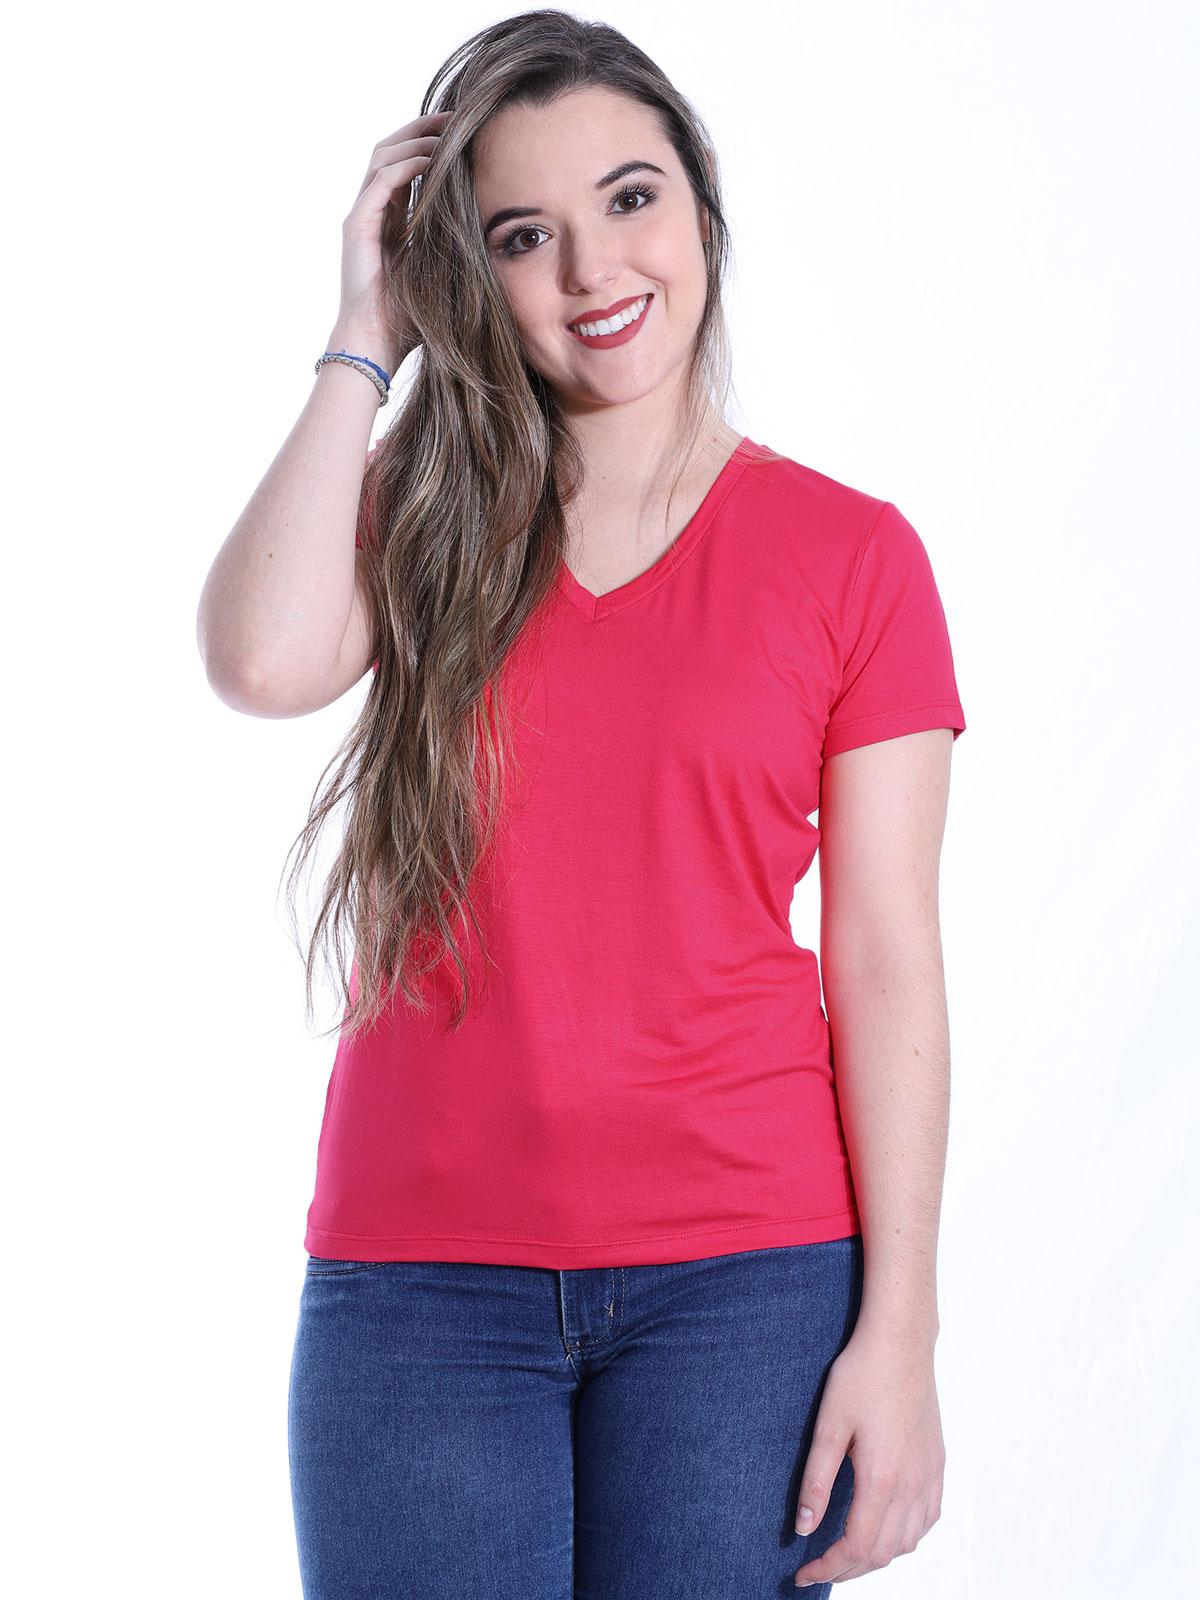 Baby Look Anistia Decote V. Viscolycra Lisa Pink